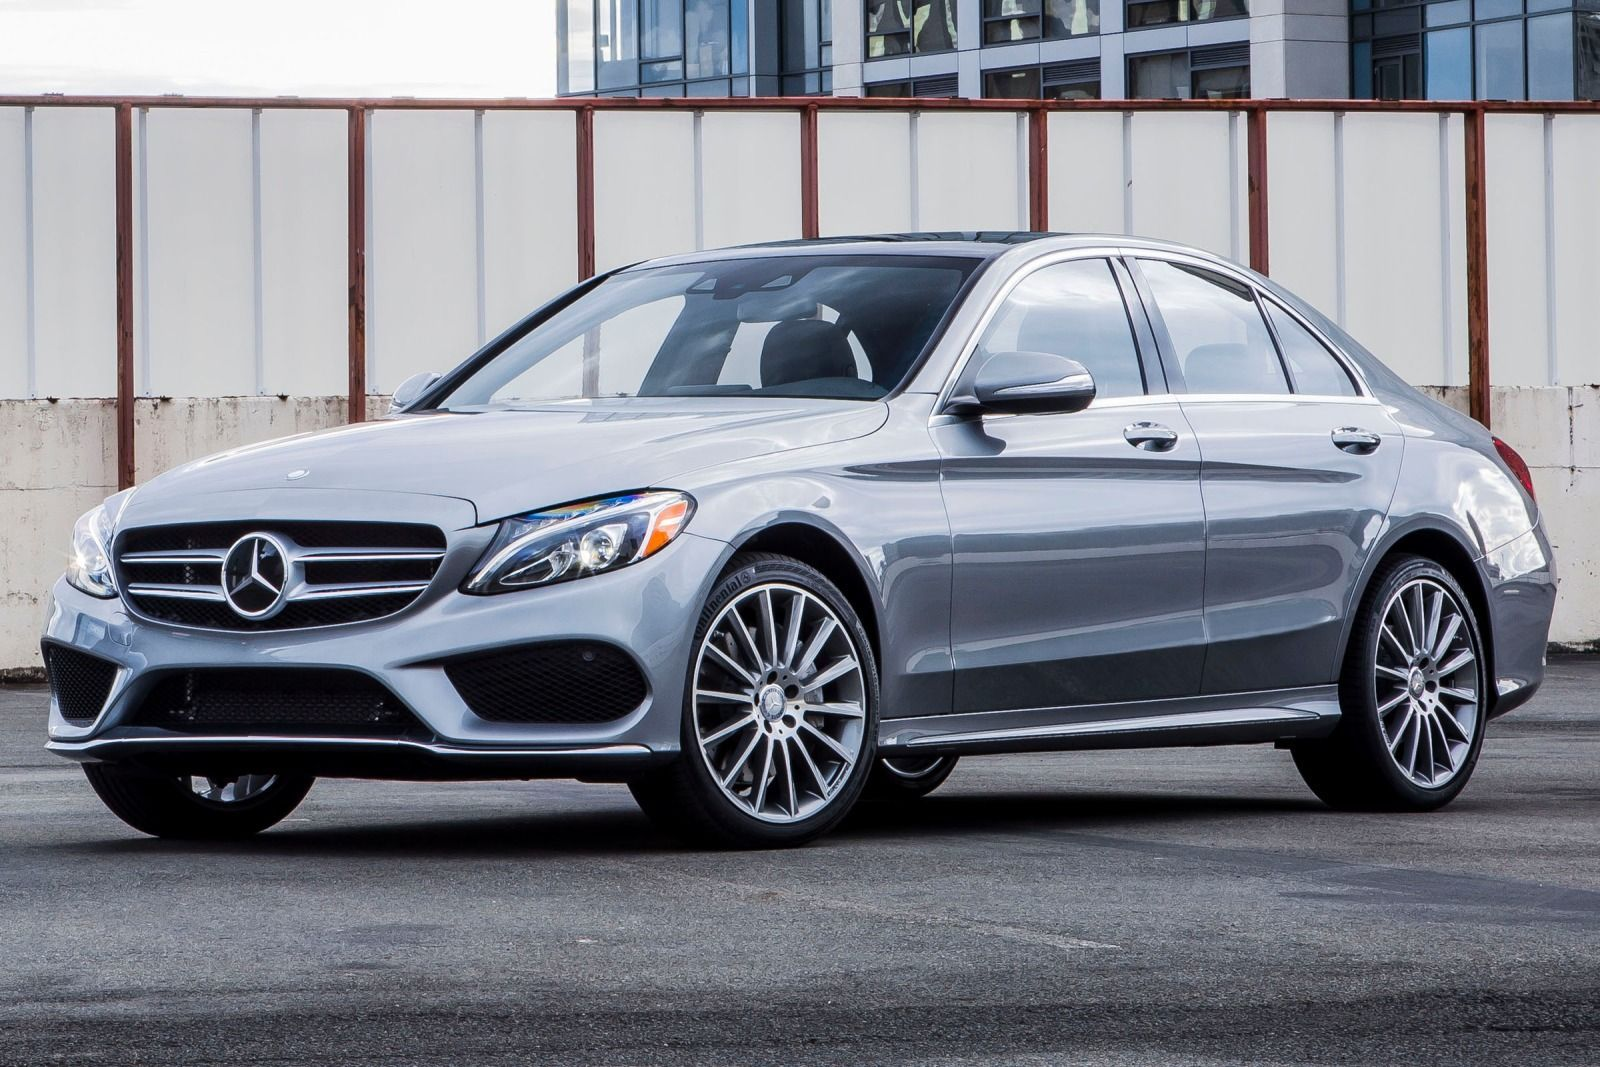 2015 luxury sedans 2015 mercedes benz c class c300 for Mercedes benz c300 luxury